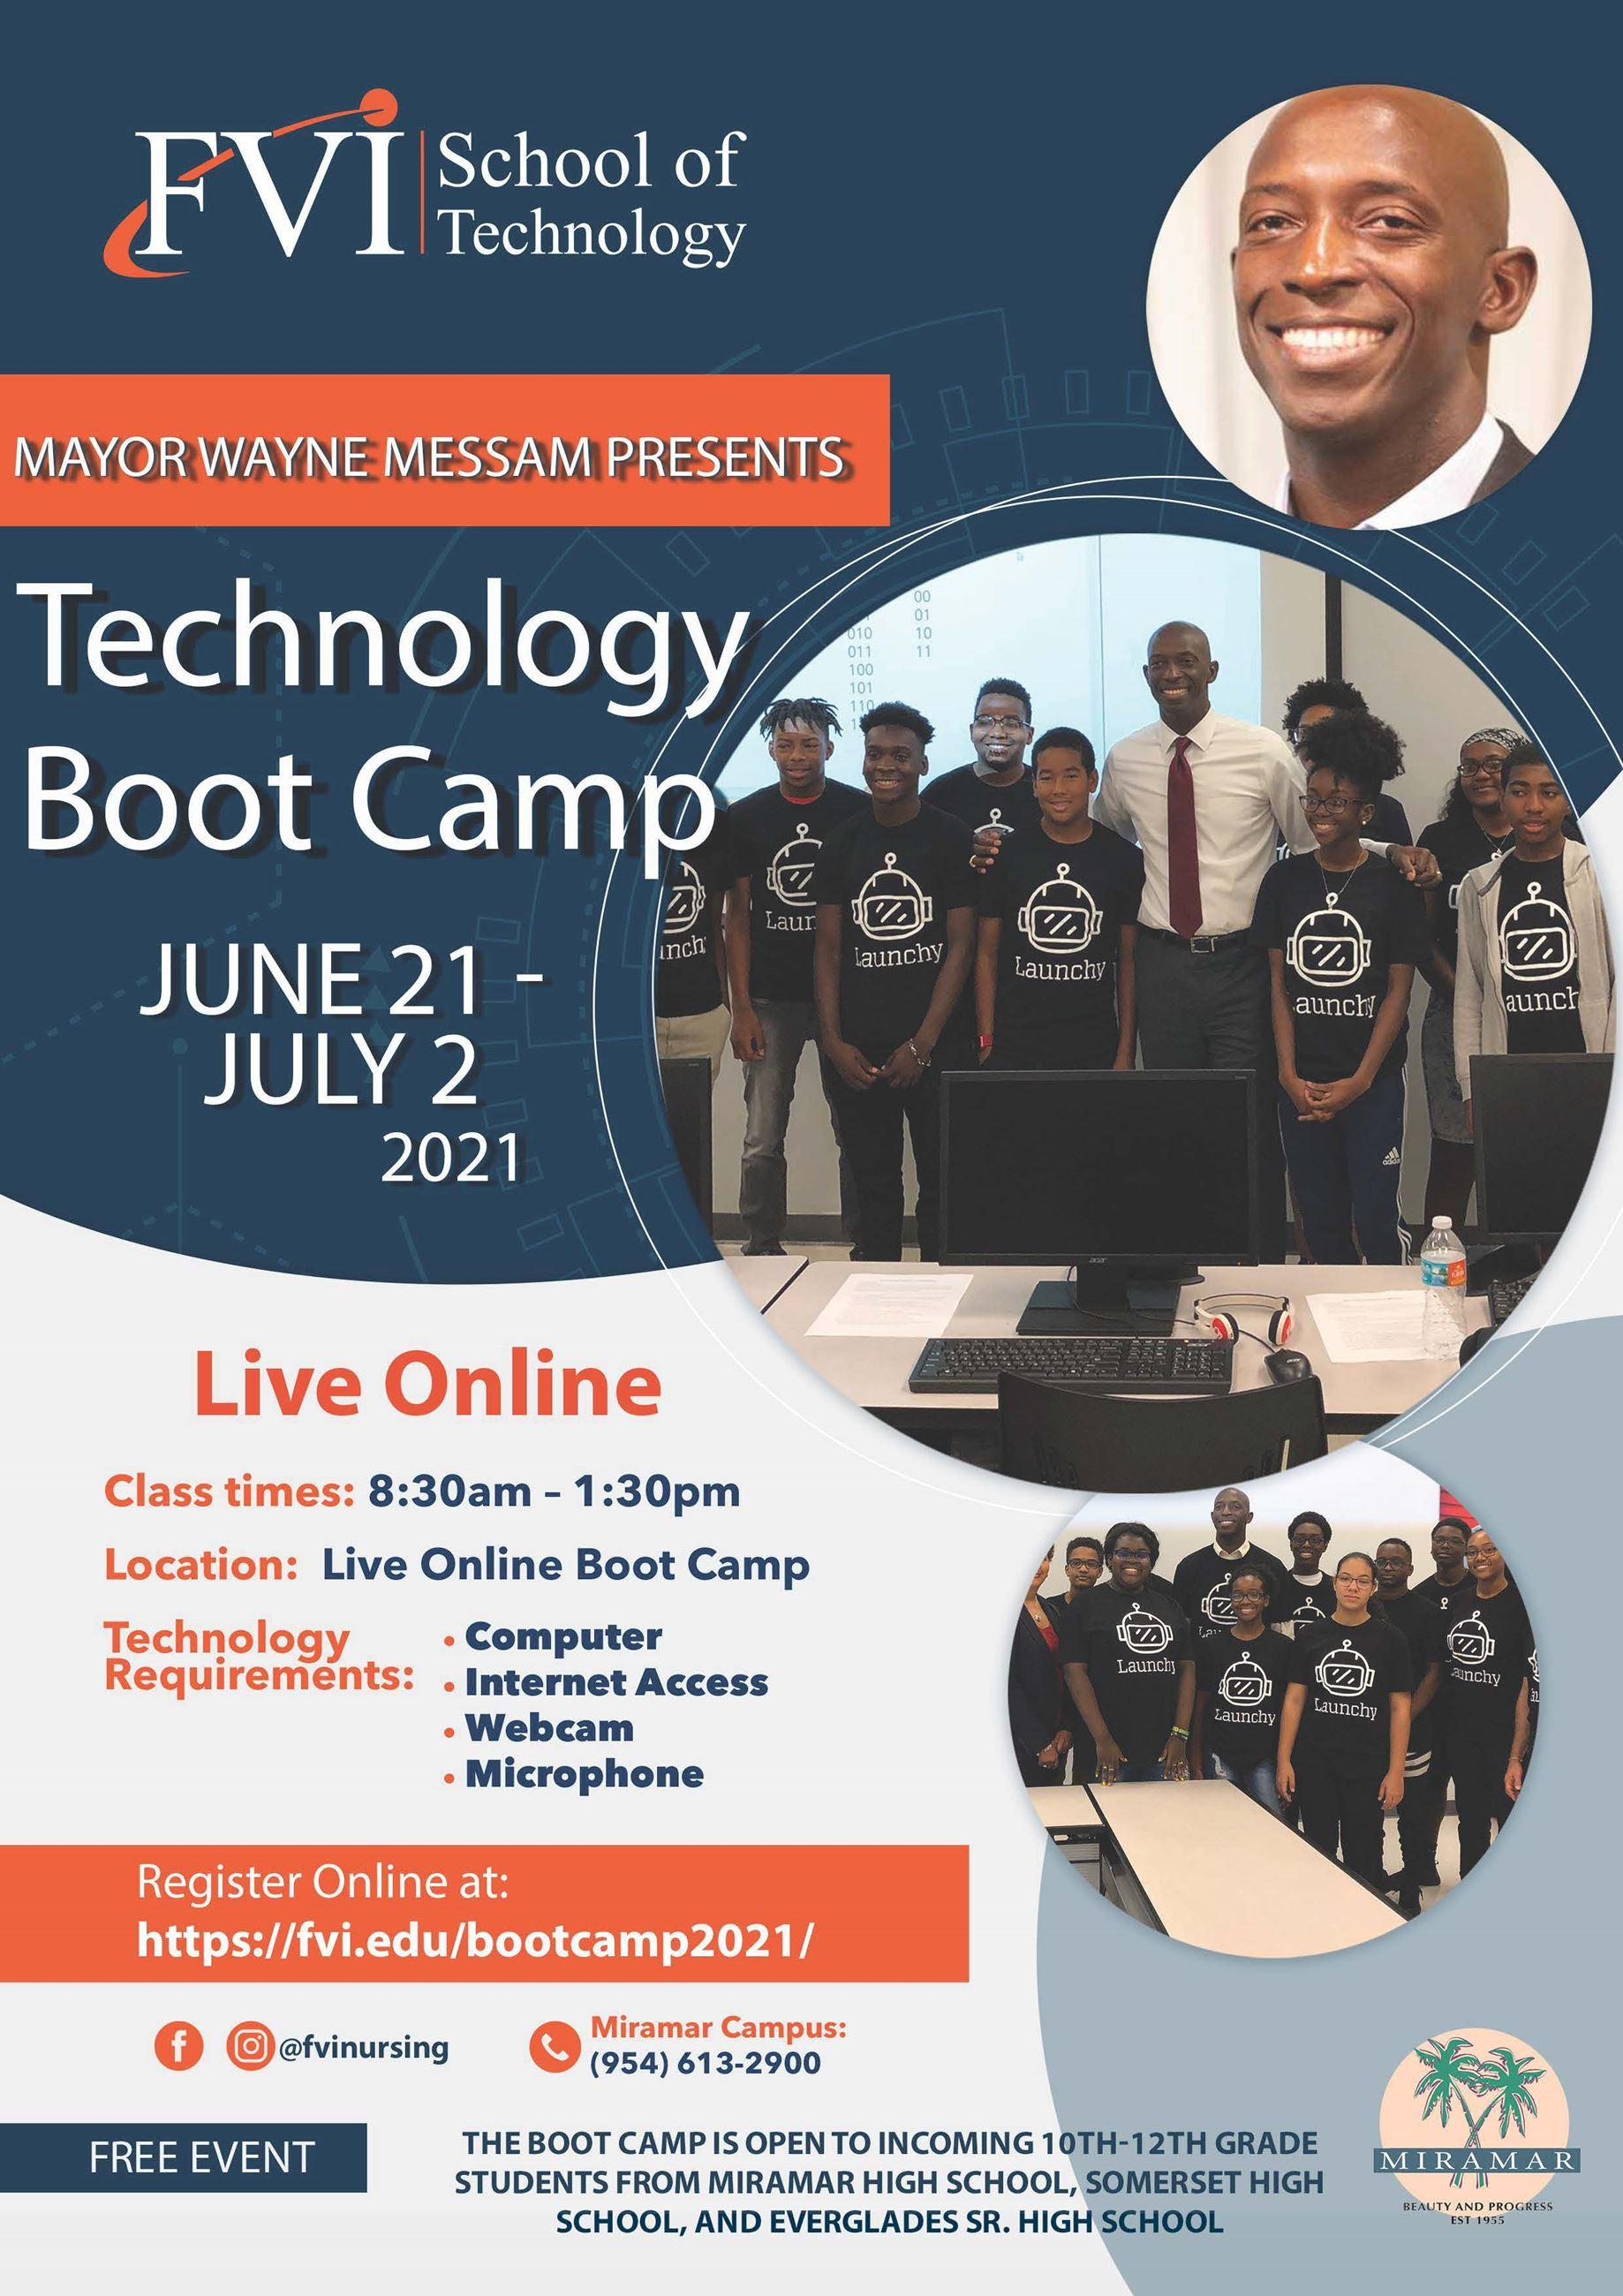 2021 Mayor Messam Summer Technology Bootcamp